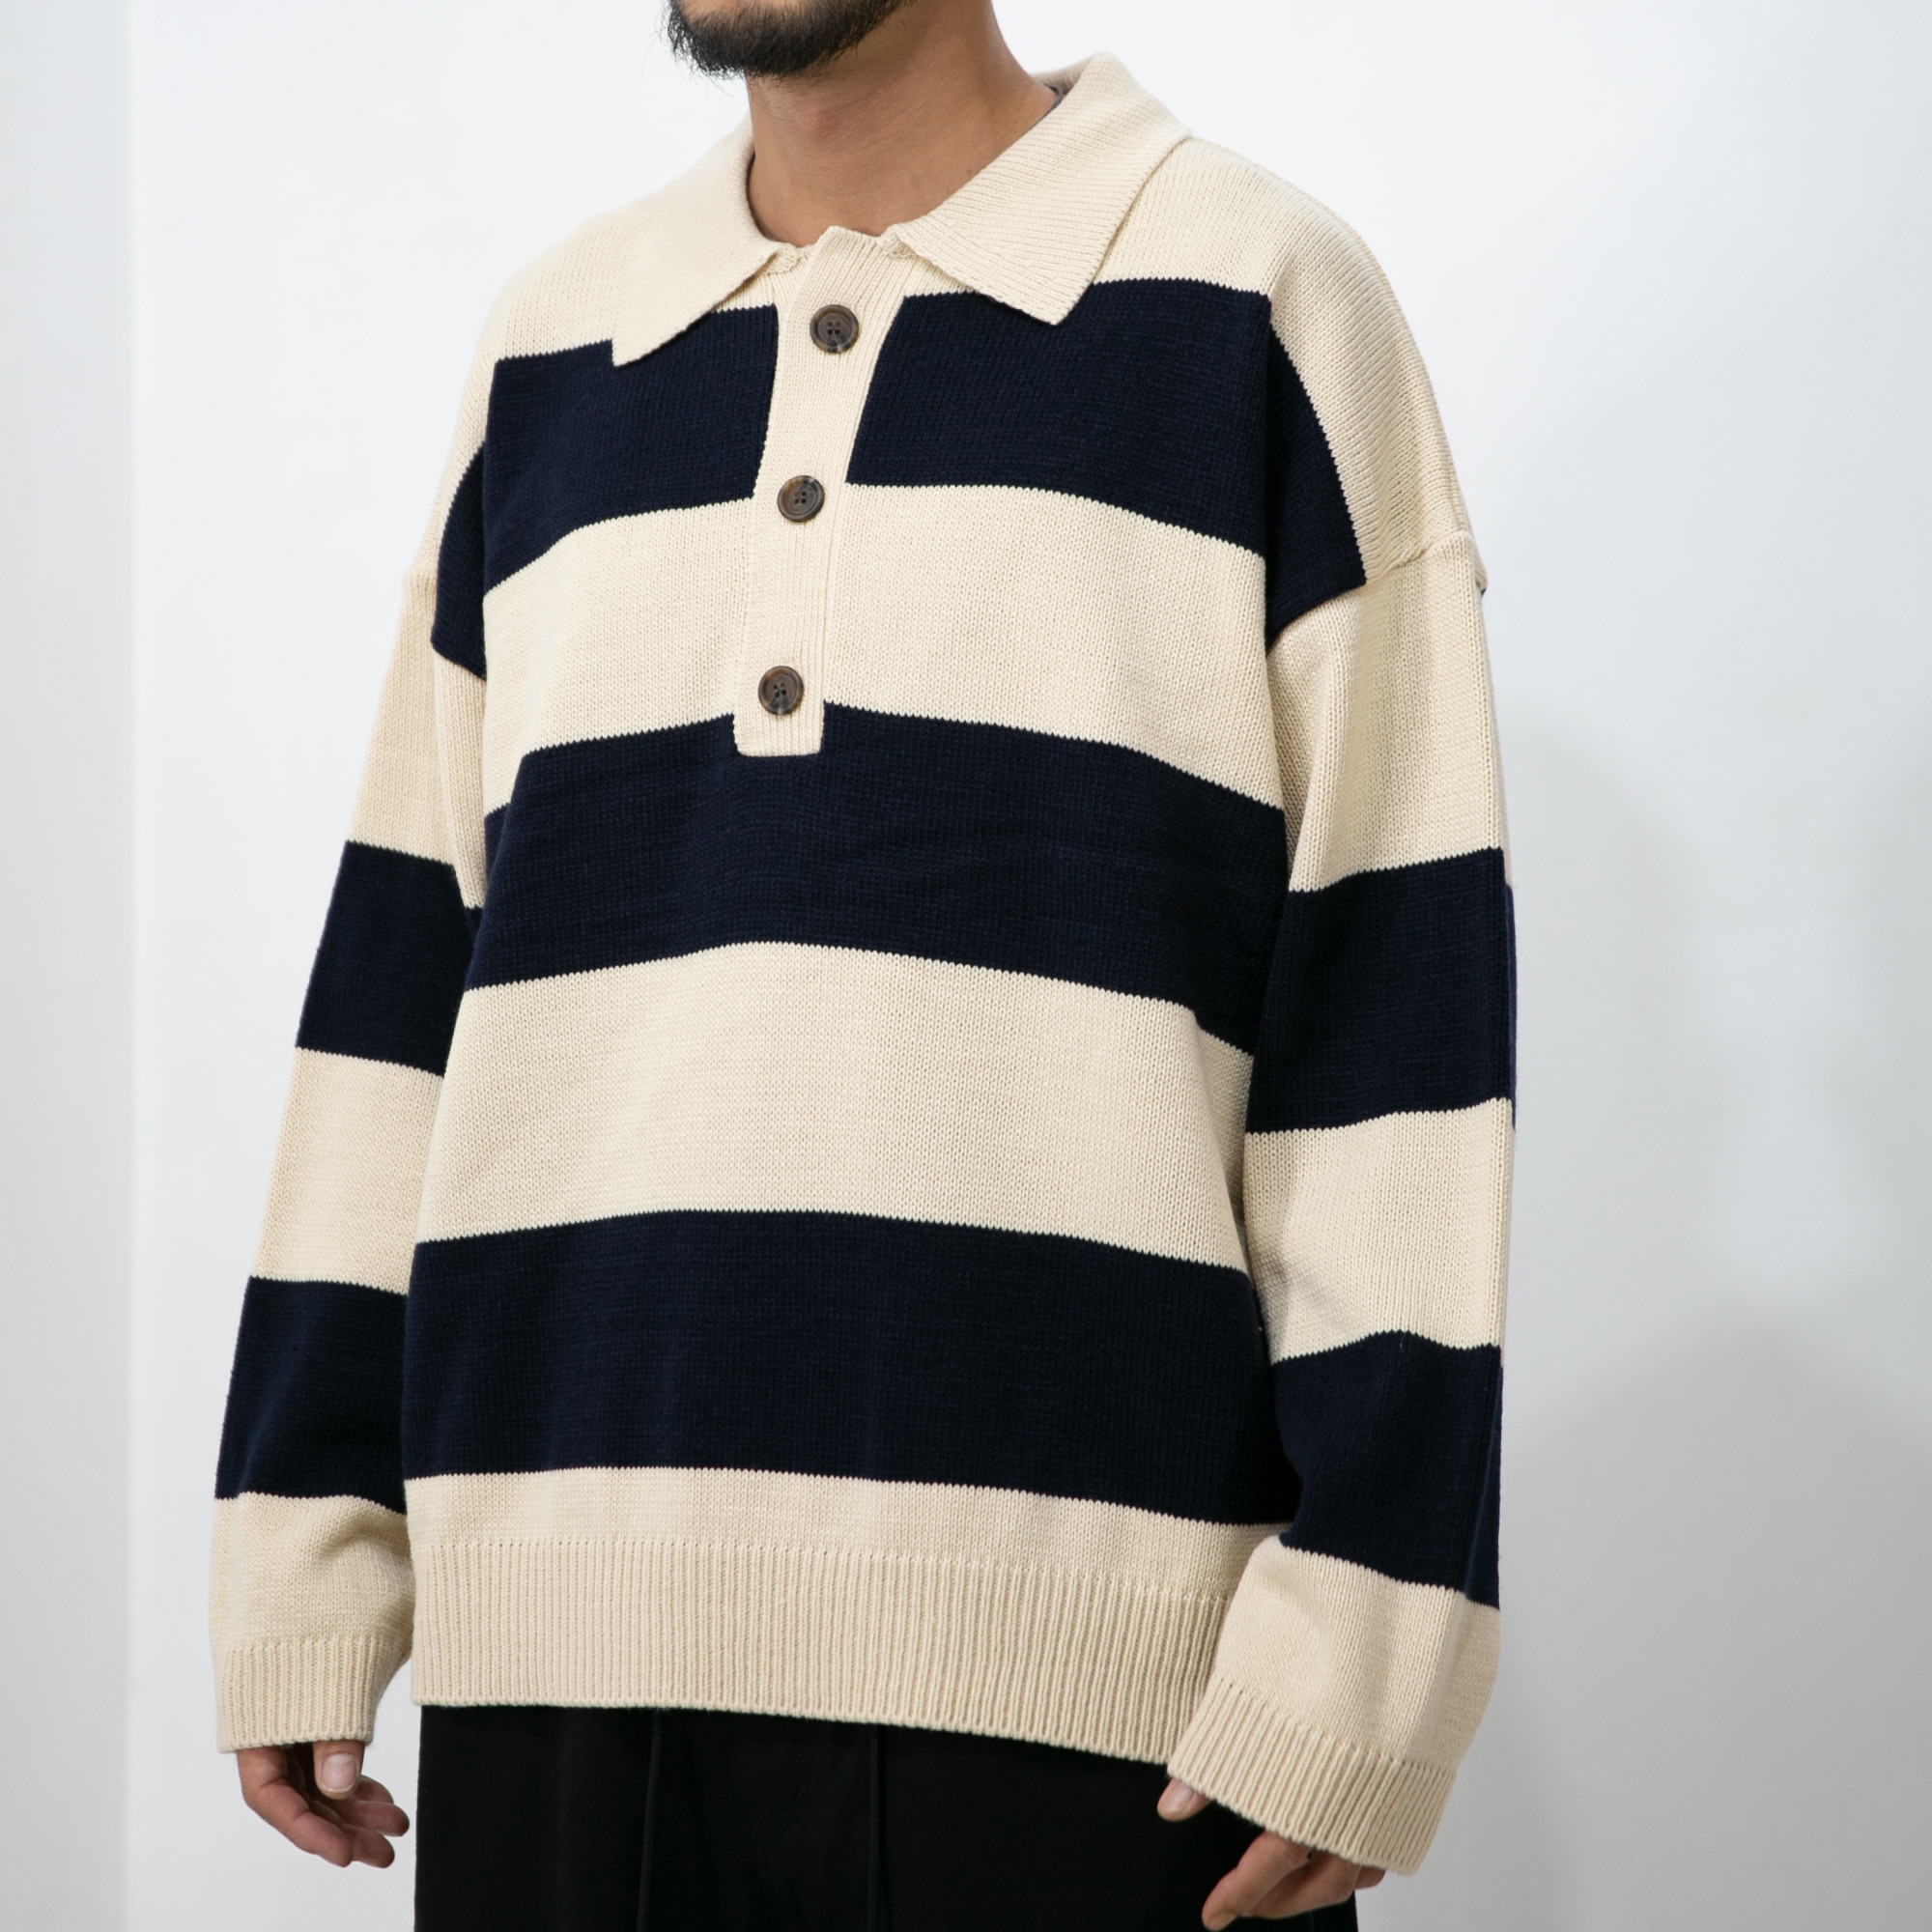 Lay Stripe PK Knit - Navy